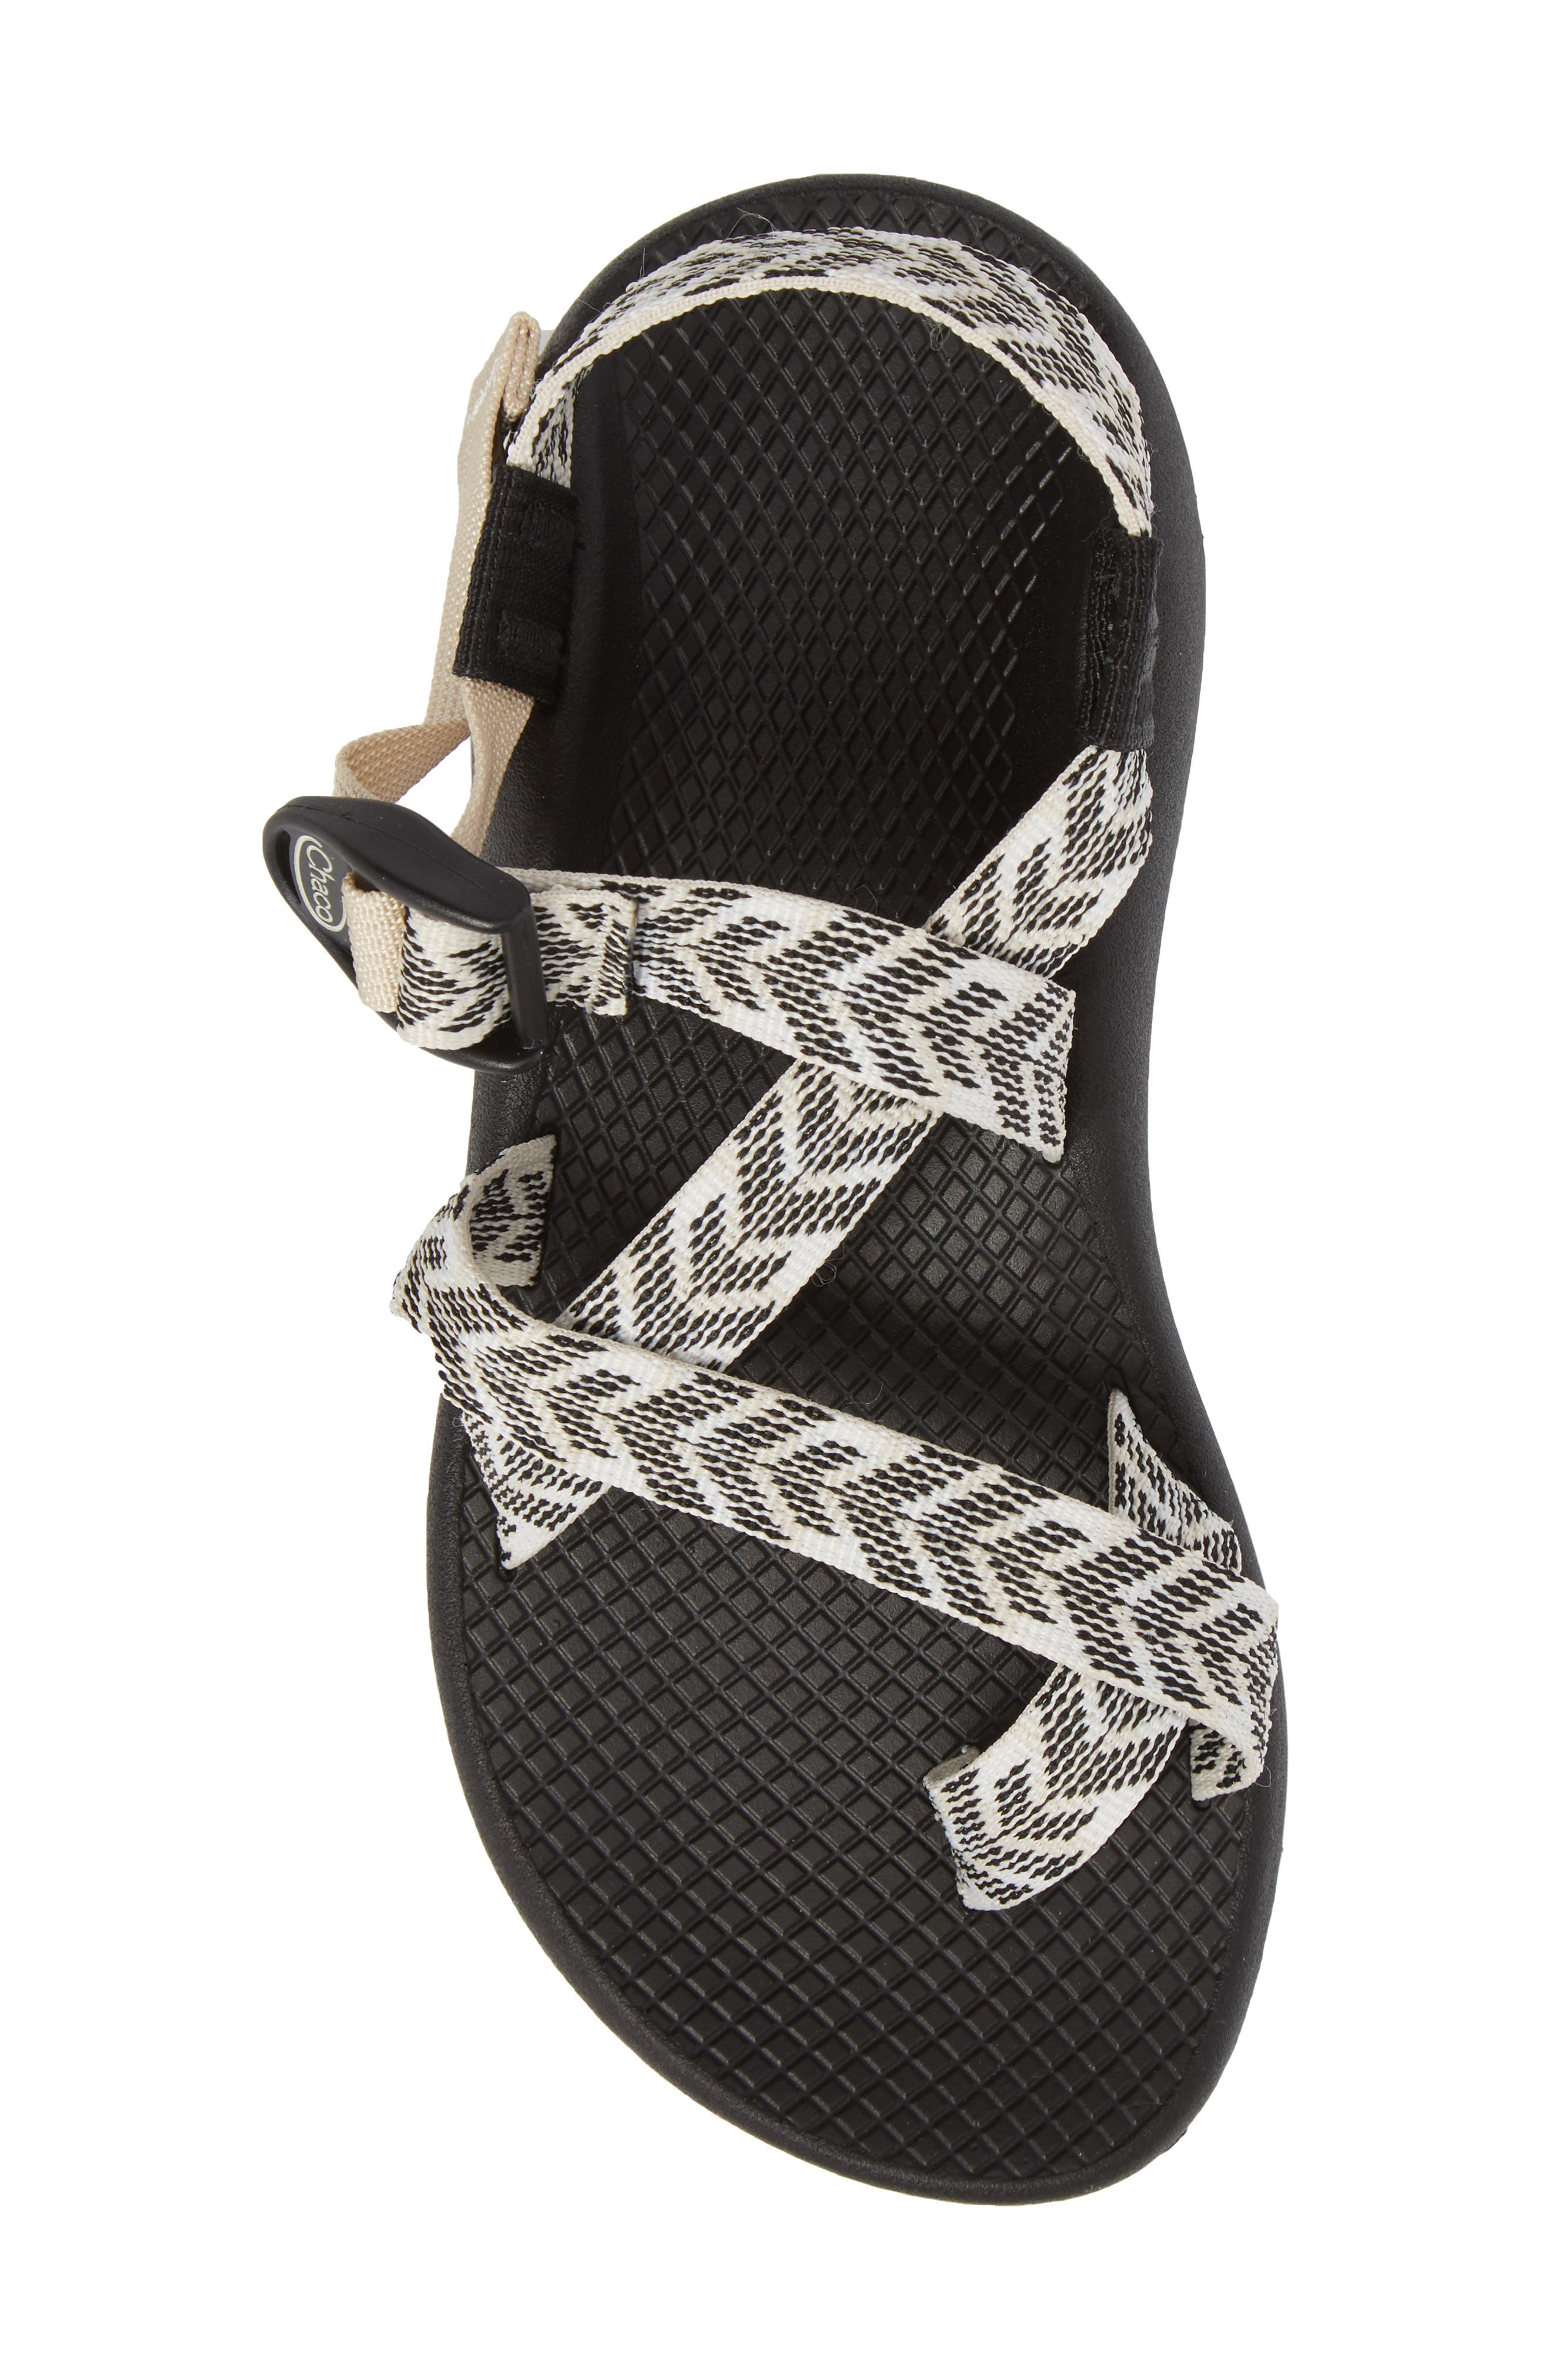 Z/2 Classic Sport Sandal,                             Alternate thumbnail 5, color,                             TRINE BLACK / WHITE